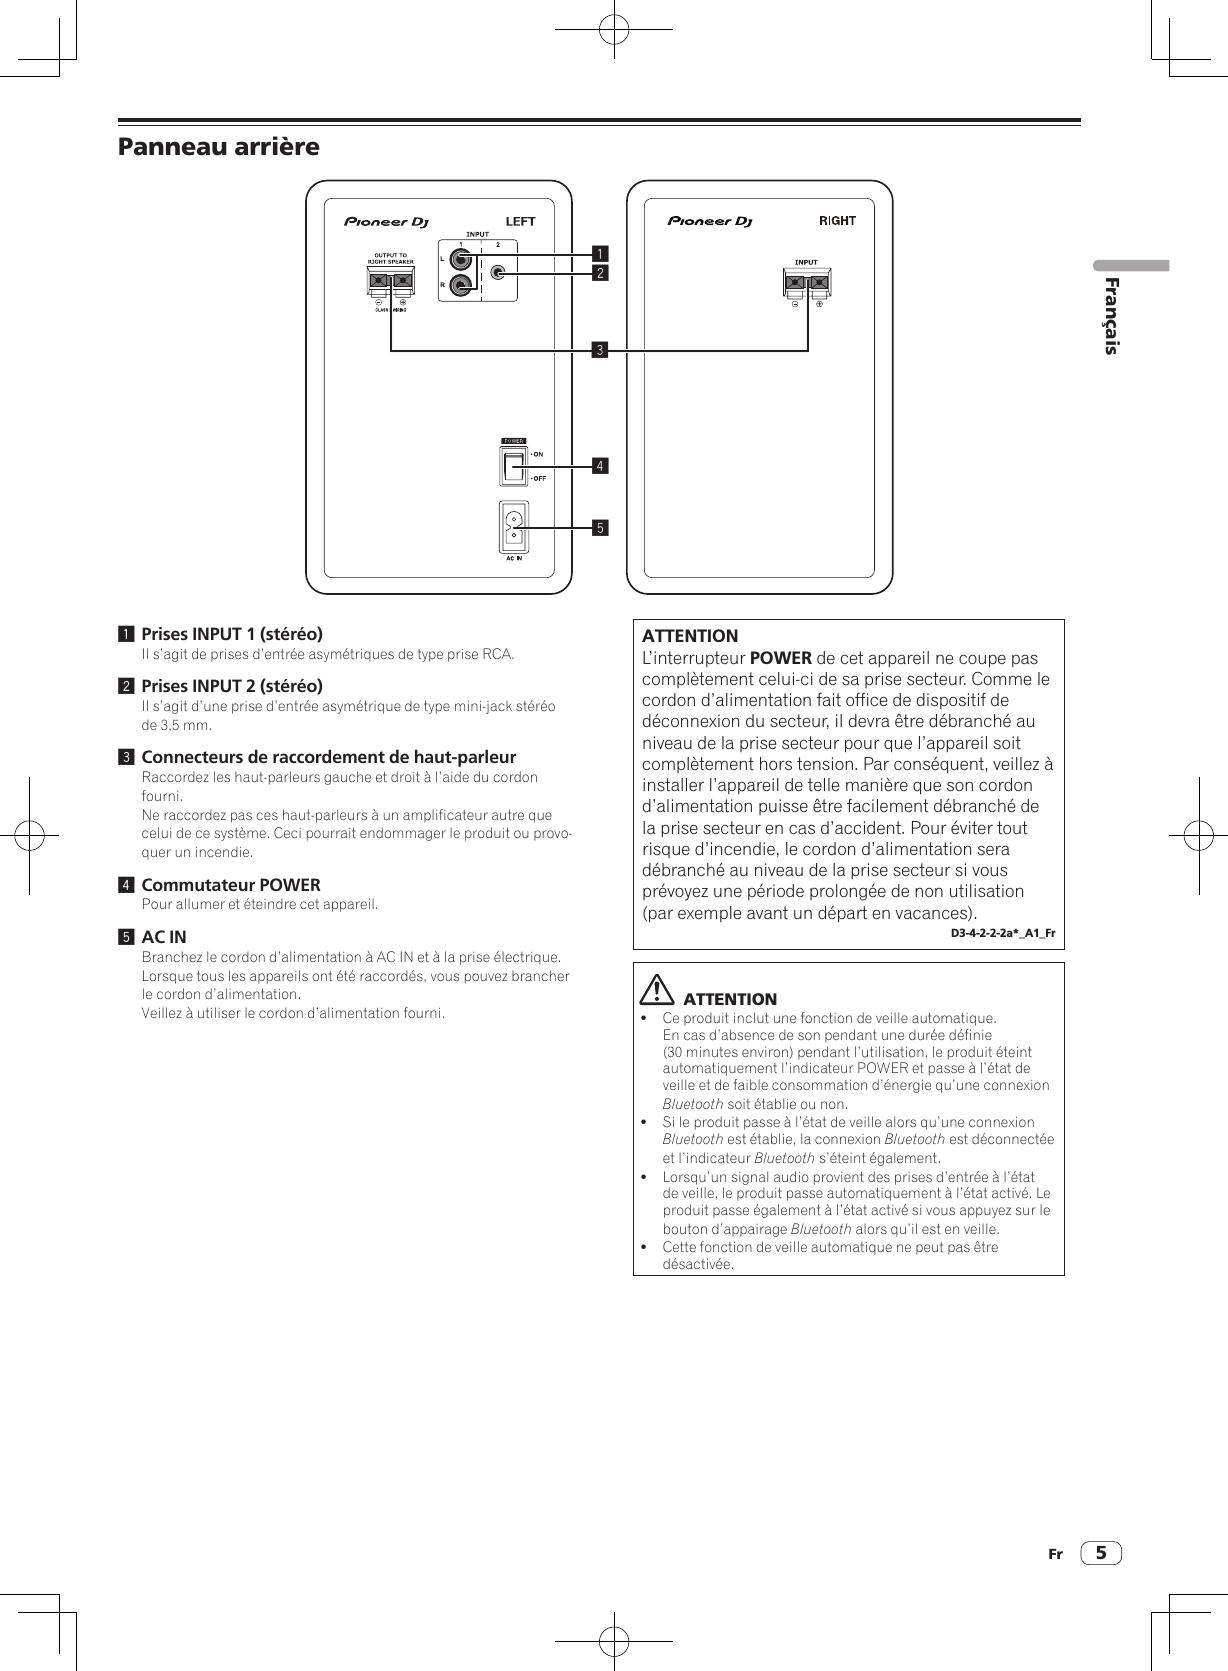 Type De Haut Parleur pioneer dj dm40bt active monitor speaker user manual part 1